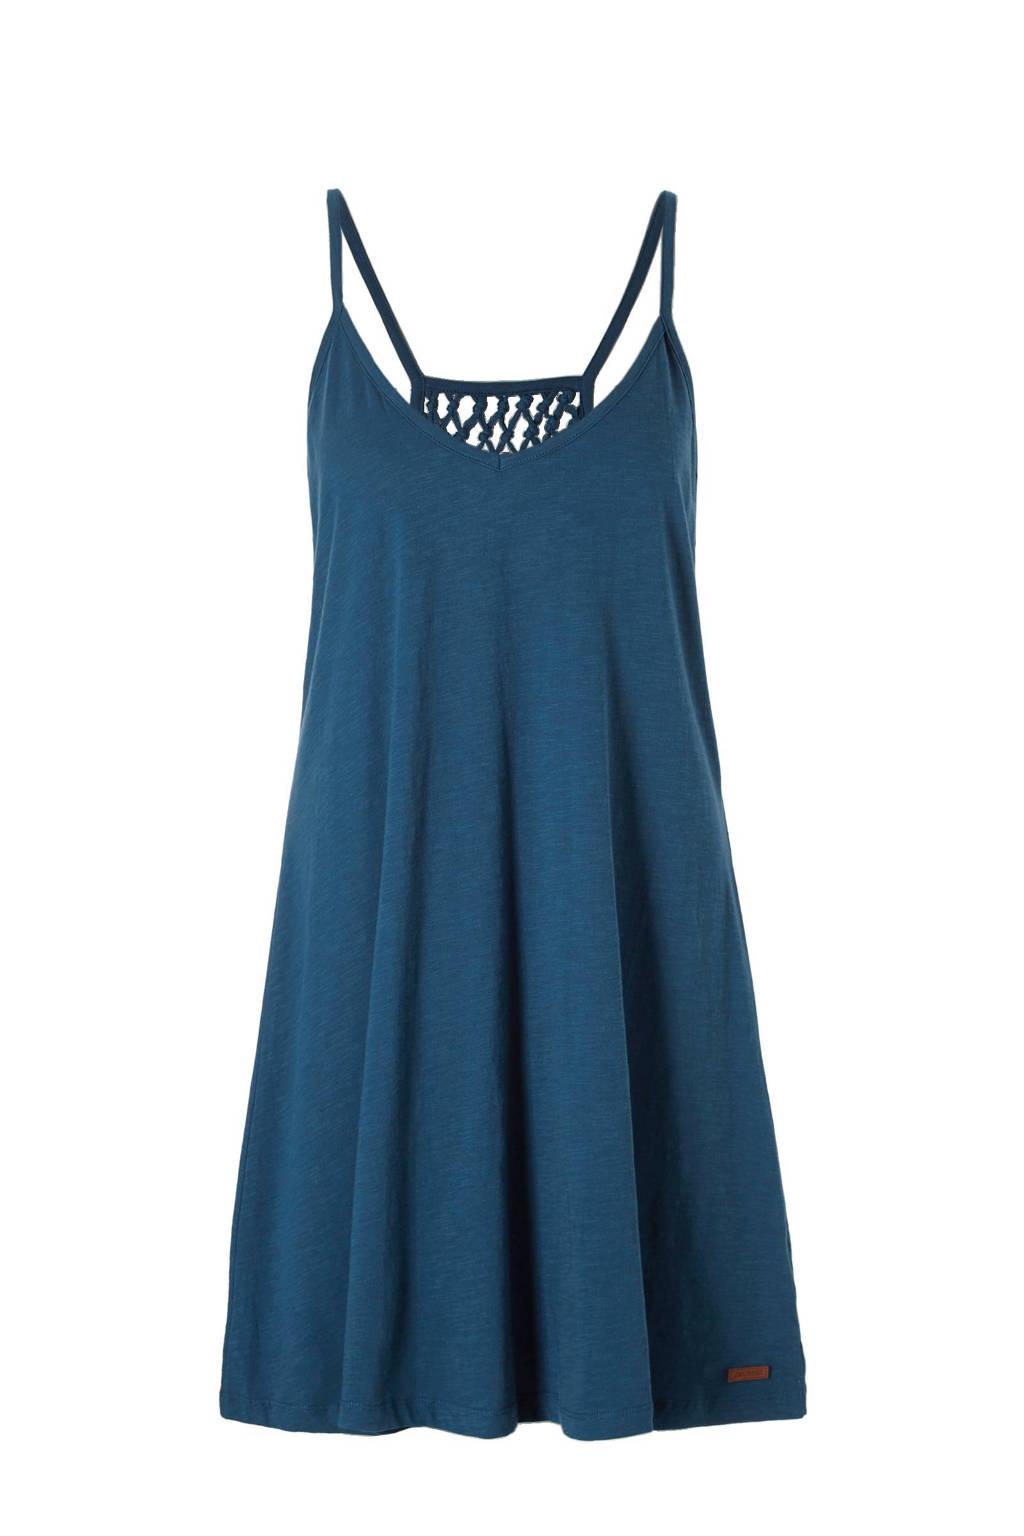 Protest jurk, Blauw